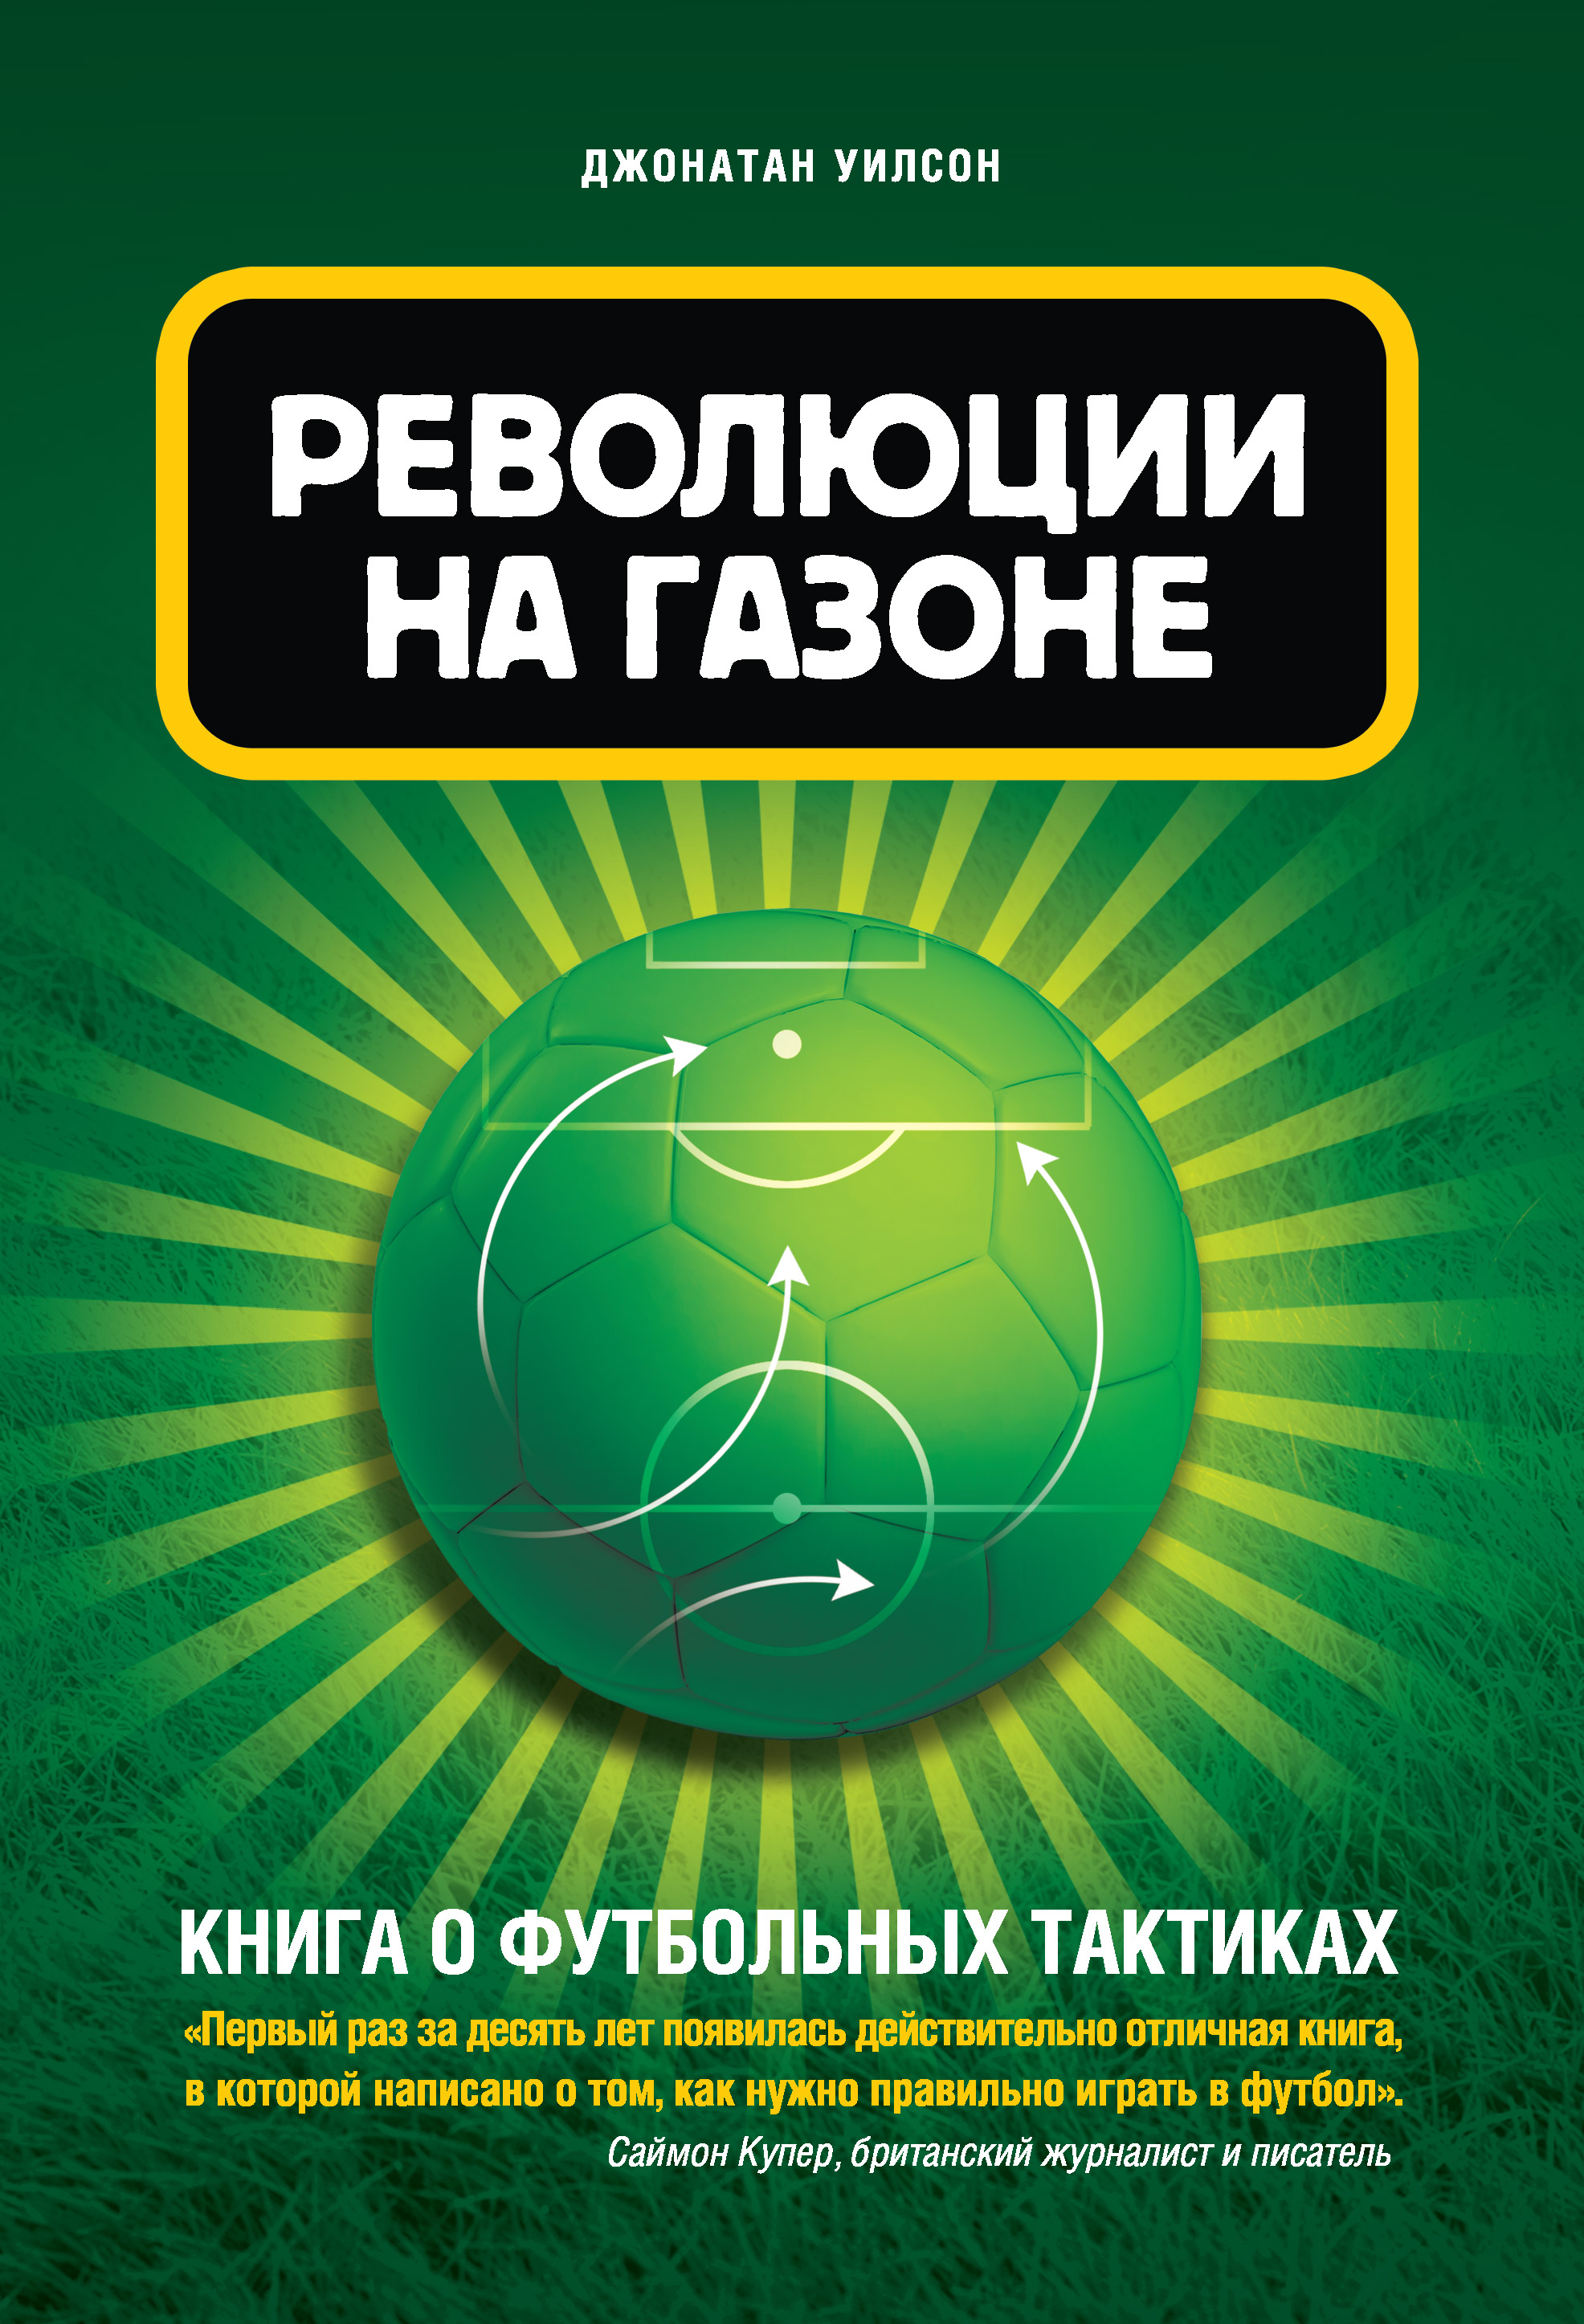 Джонатан Уилсон Революция на газоне. Книга о футбольных тактиках цены онлайн